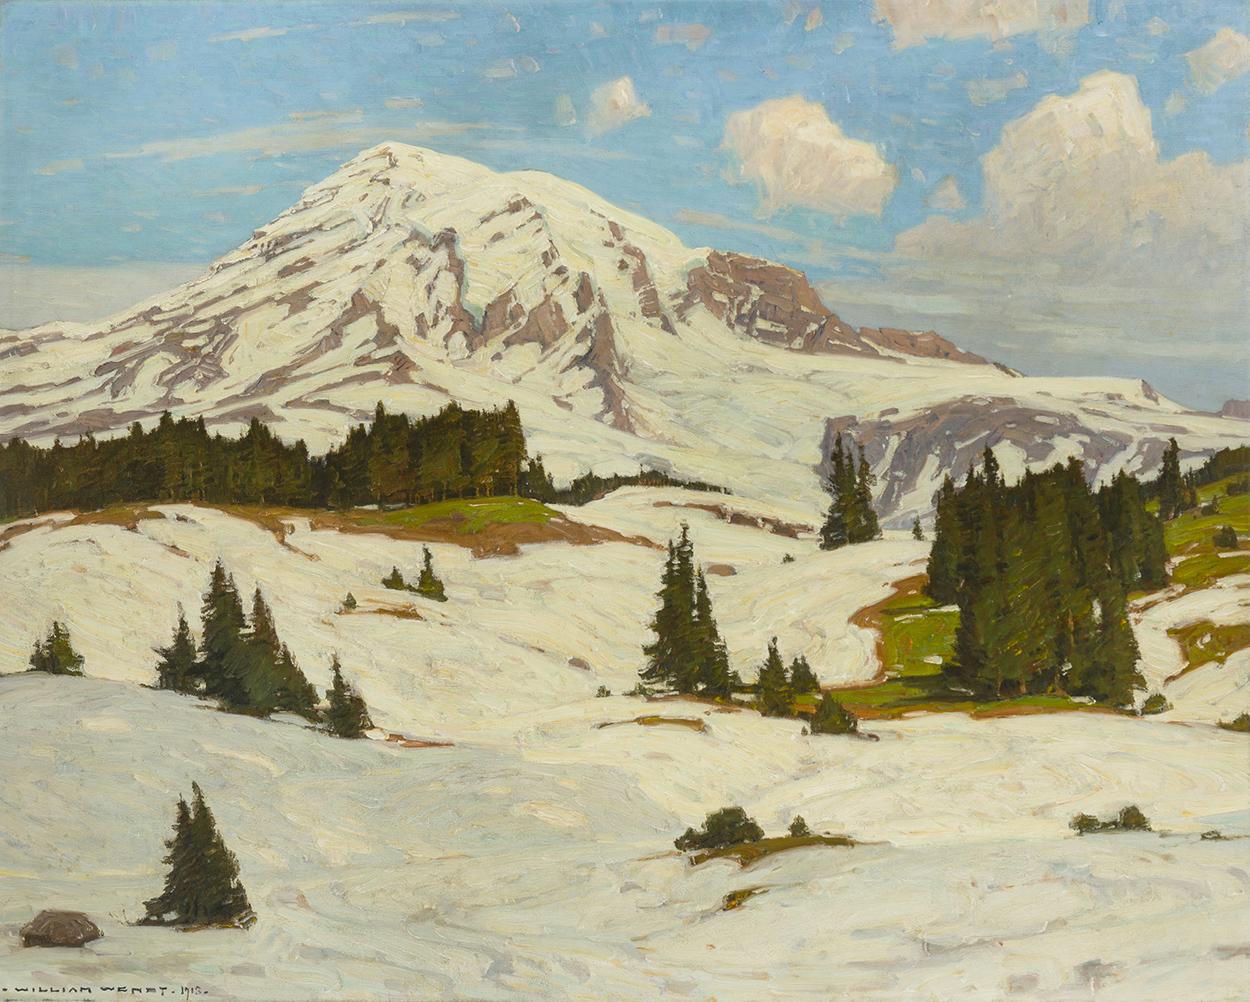 William Wendt ANA (1865-1946 Laguna Beach, CA)